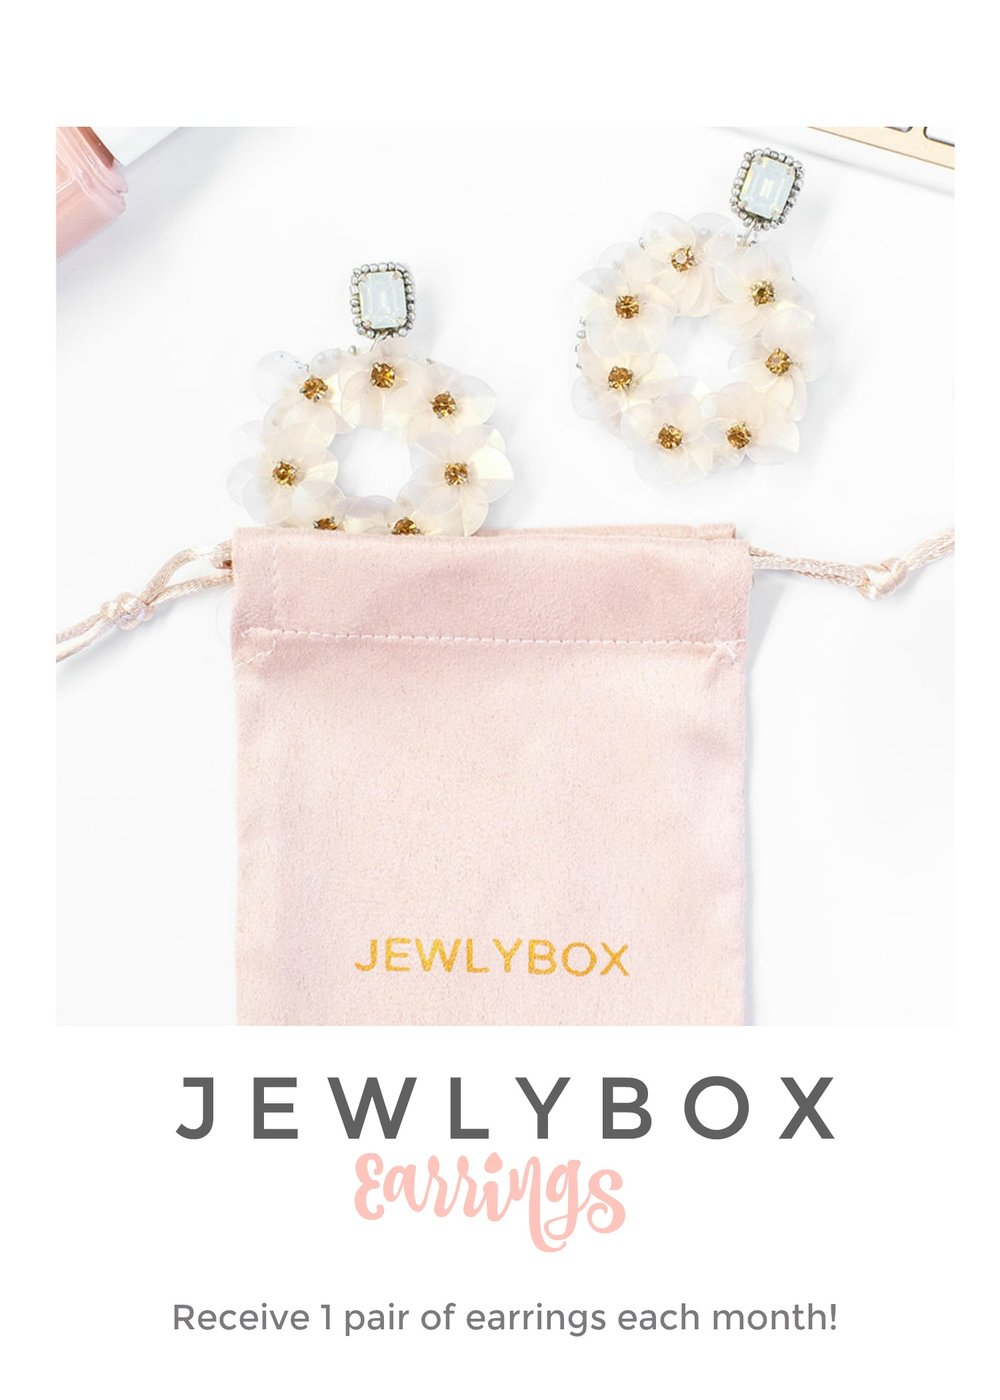 Jewlybox Product Image - Earrings.jpg